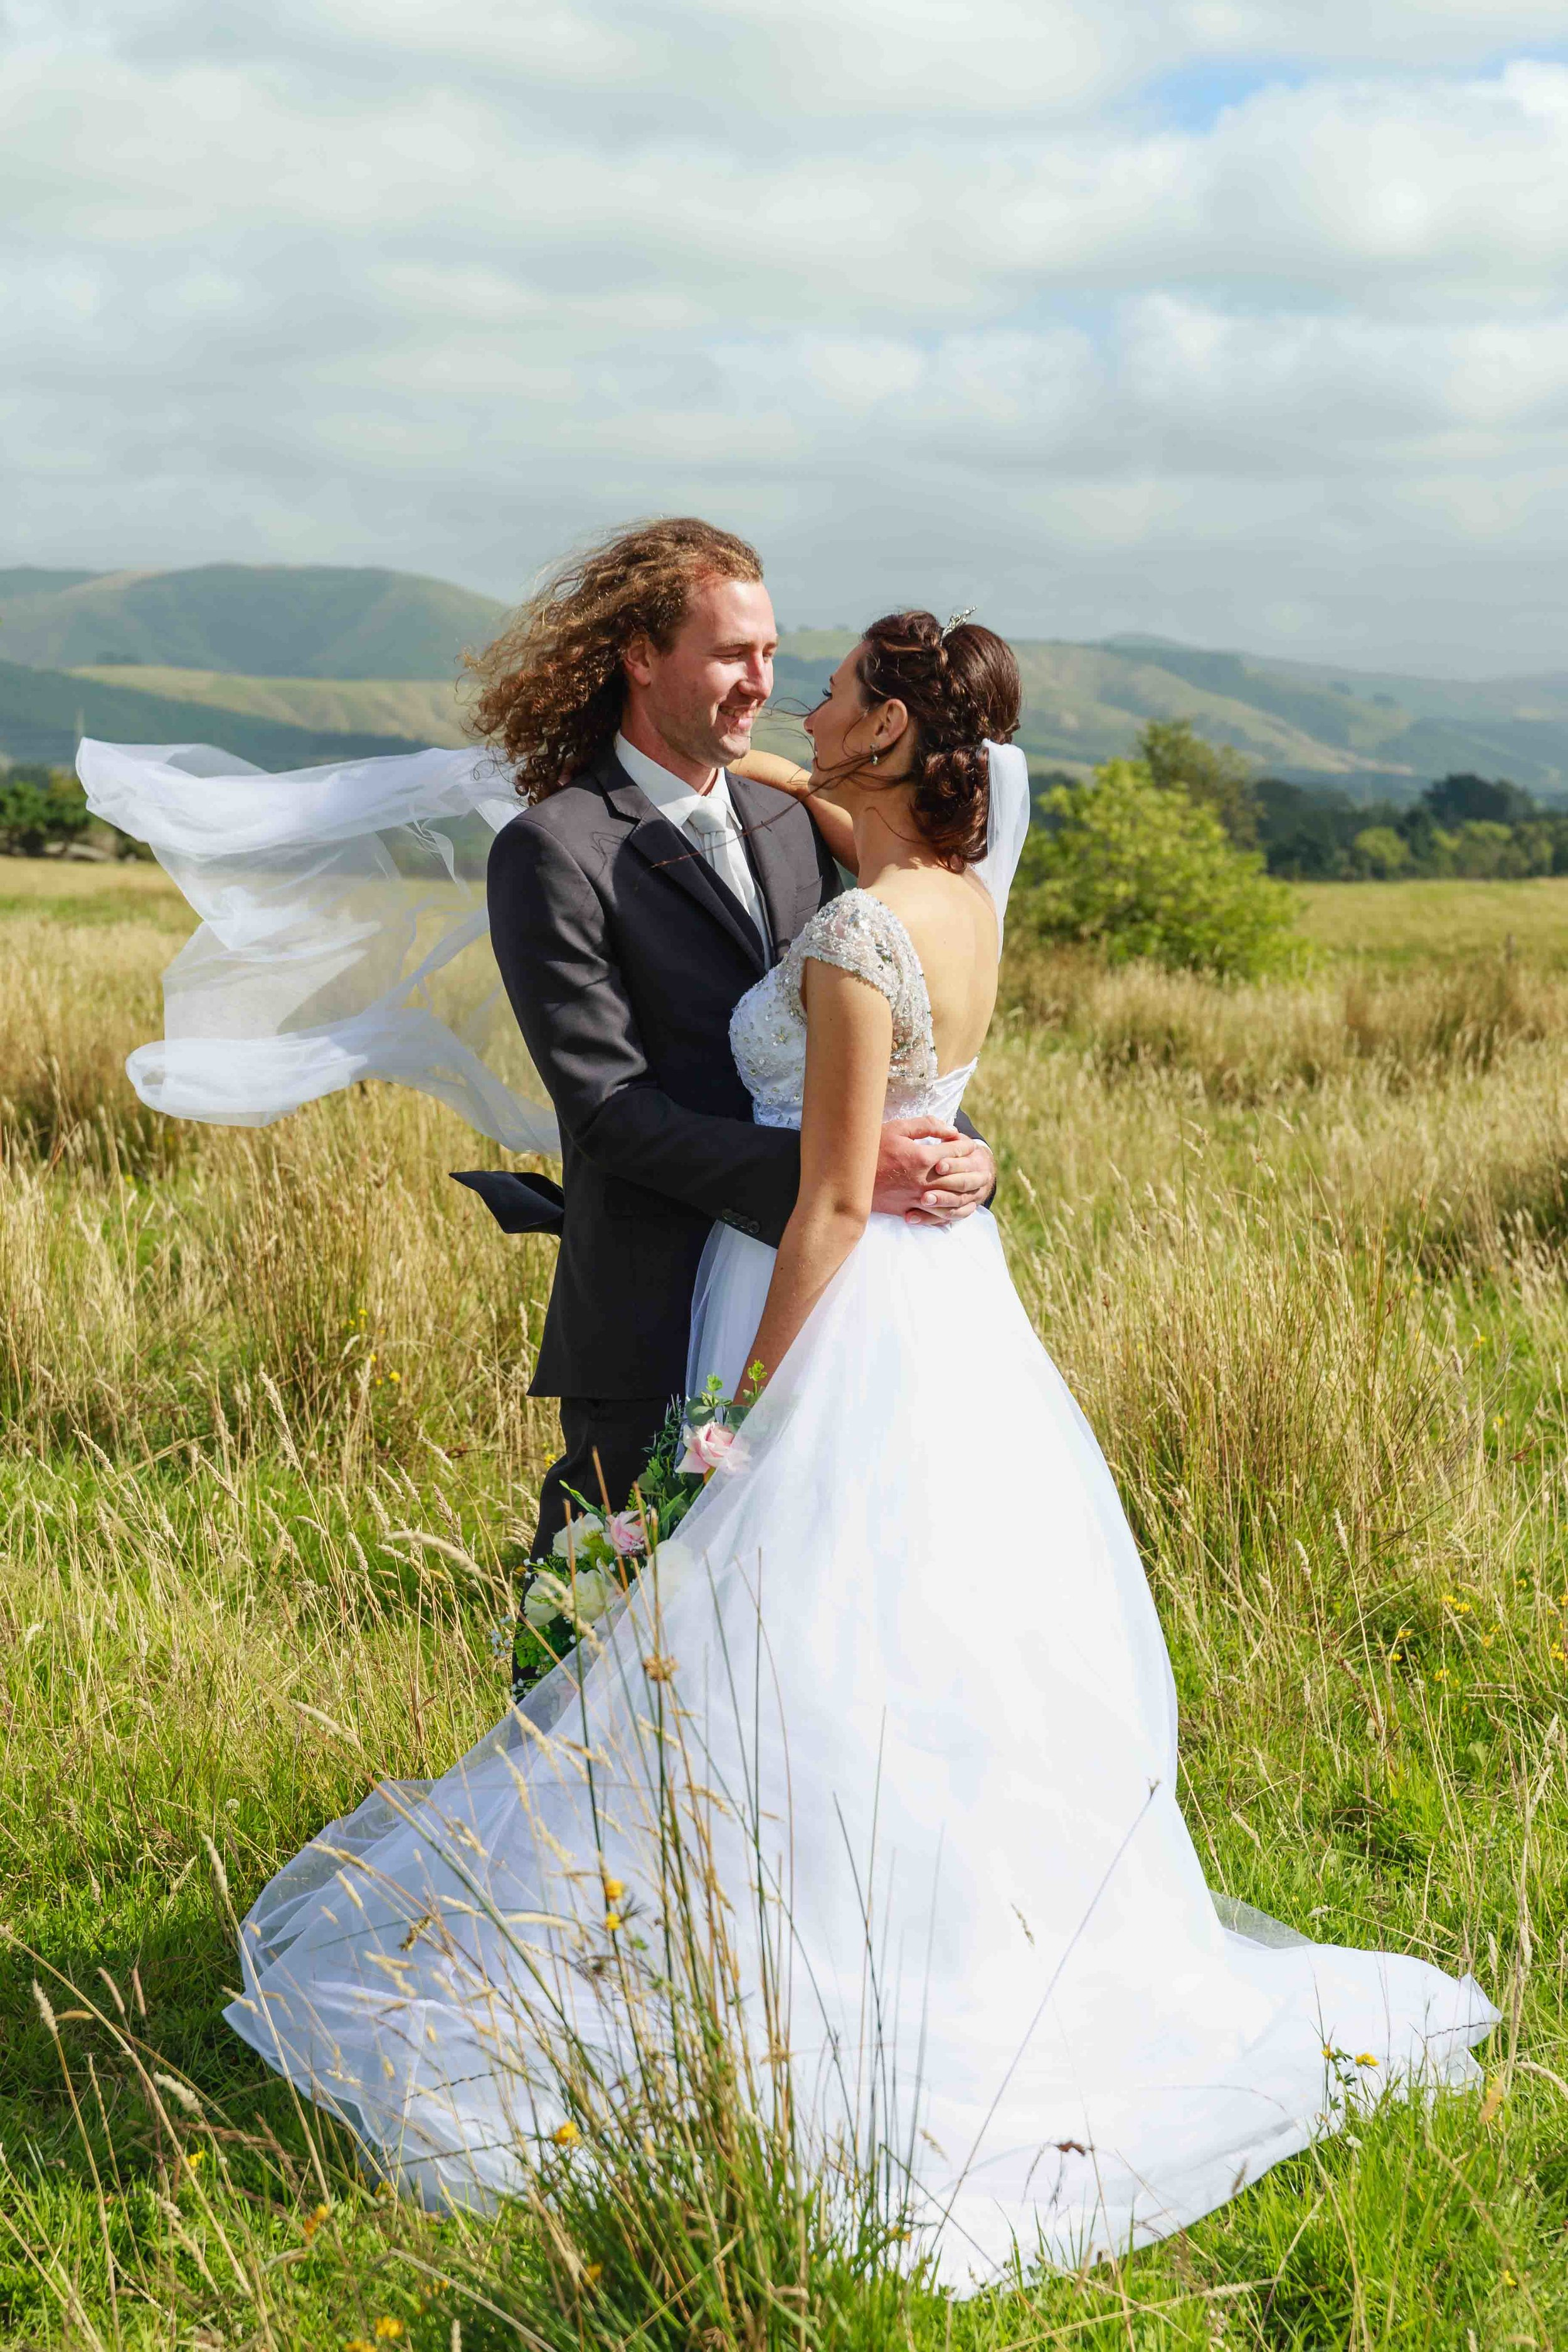 the-chalet-highlight-wedding-photography-palmerston-north-124.jpg